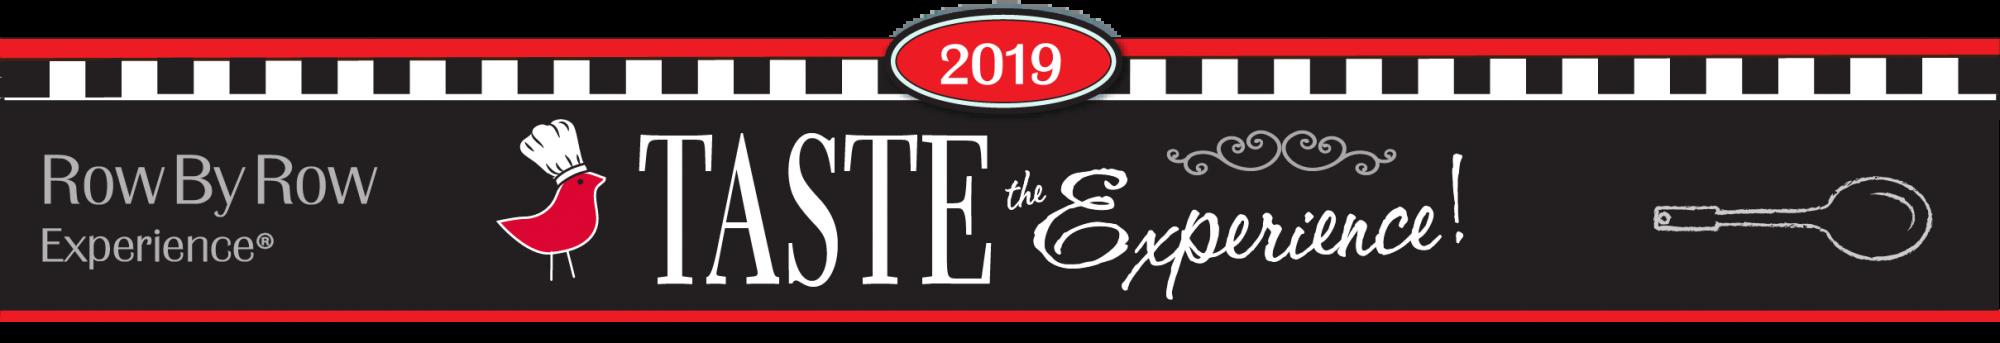 Row By Row Experience 2019